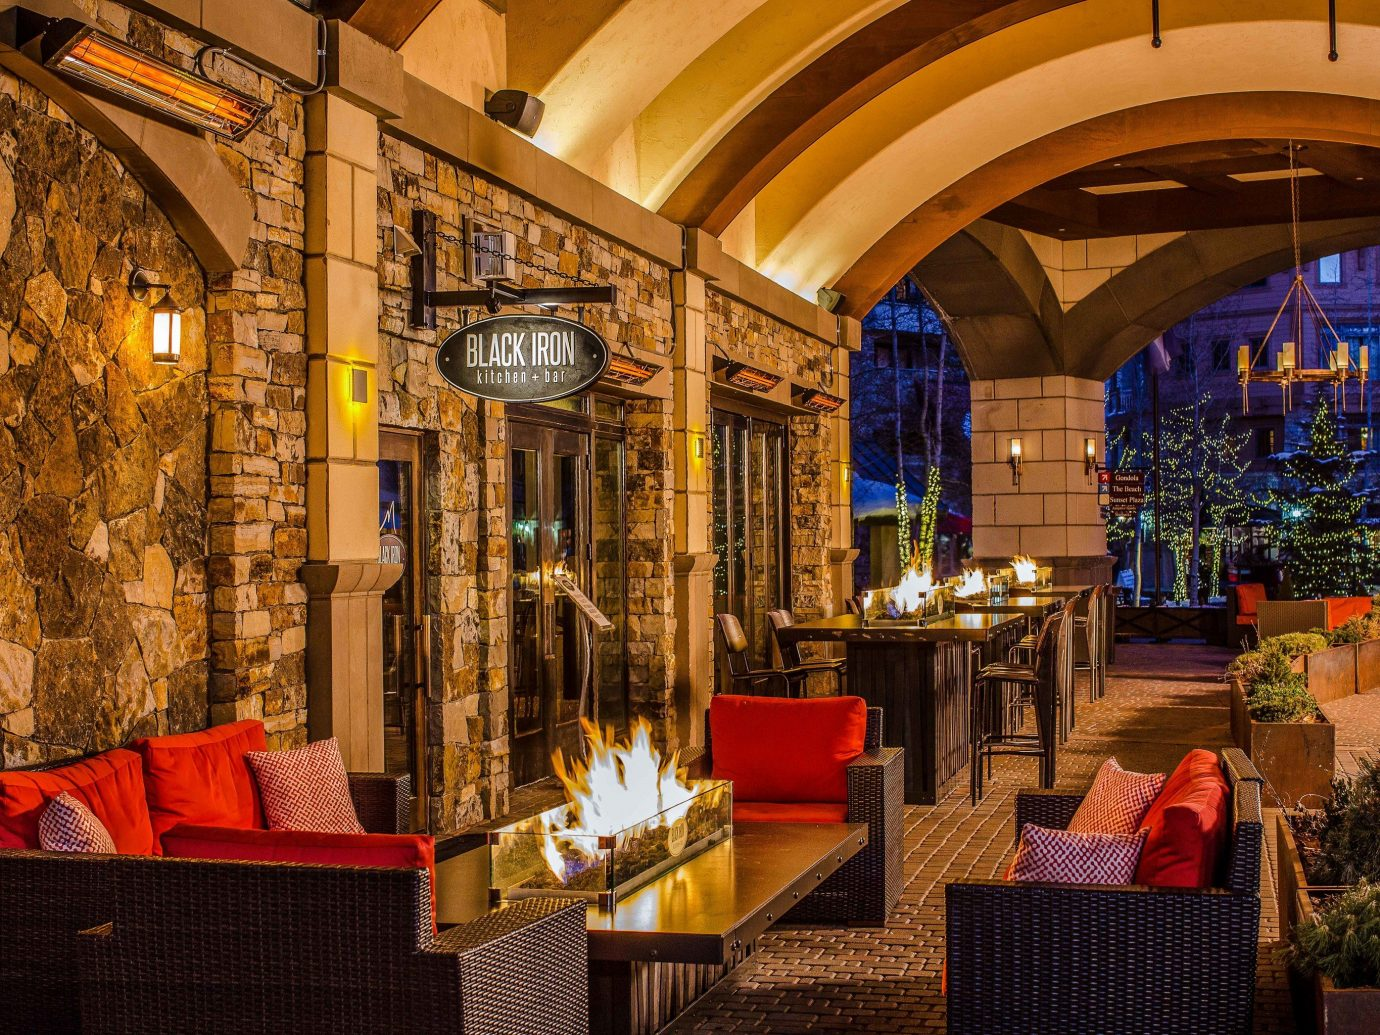 indoor restaurant red interior design lighting Lobby tavern evening night furniture